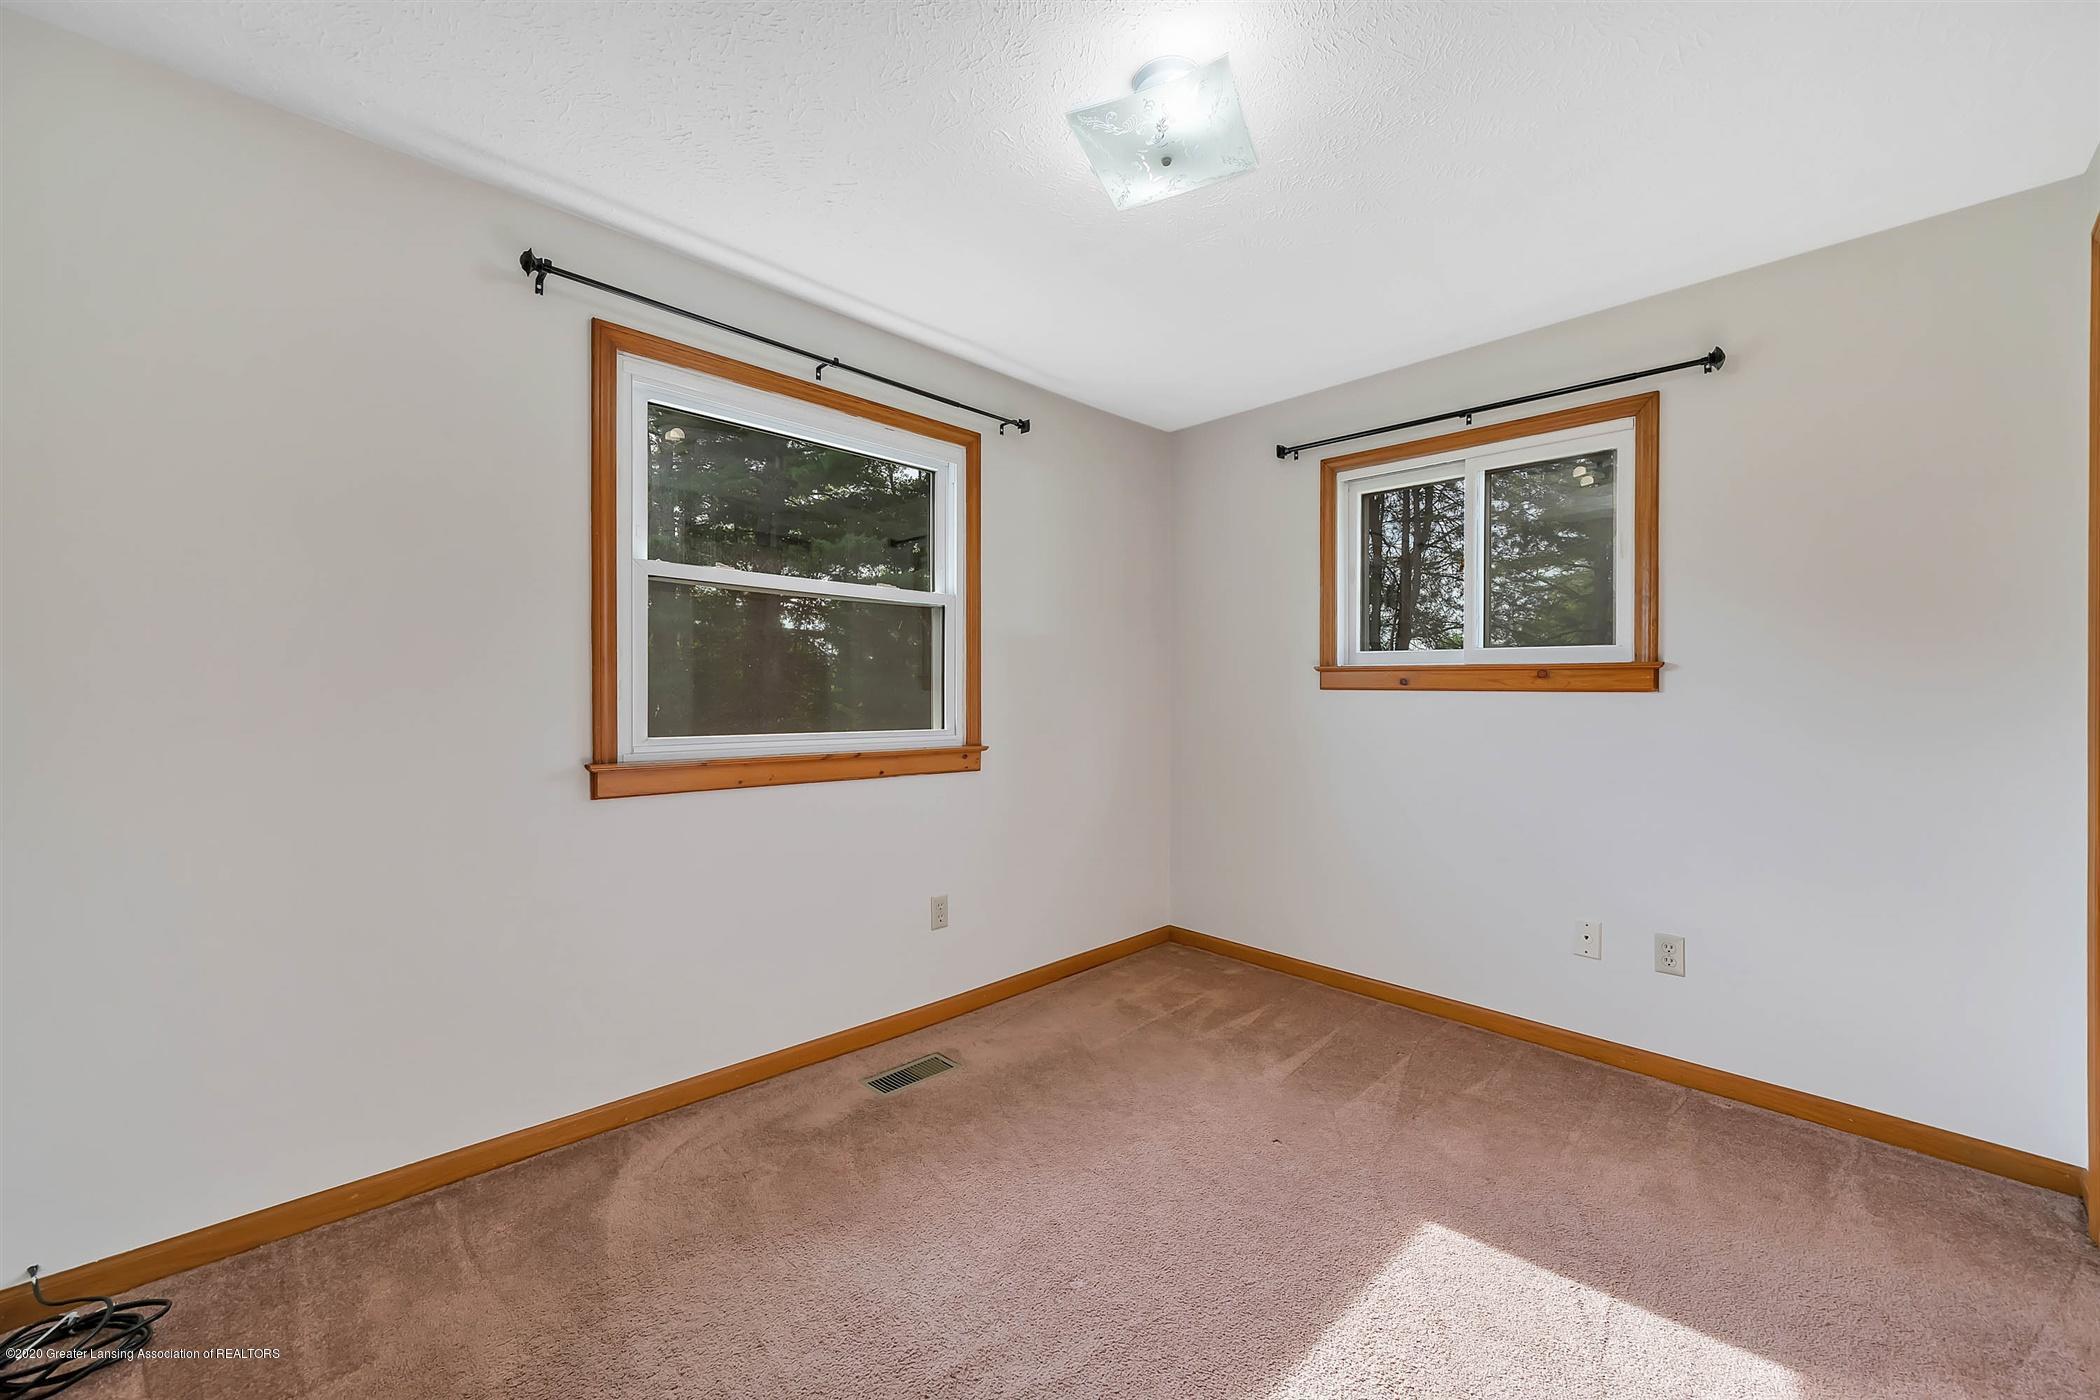 6750 W Lovejoy Rd - (28) 6756 Lovejoy Bedroom 1 - 28